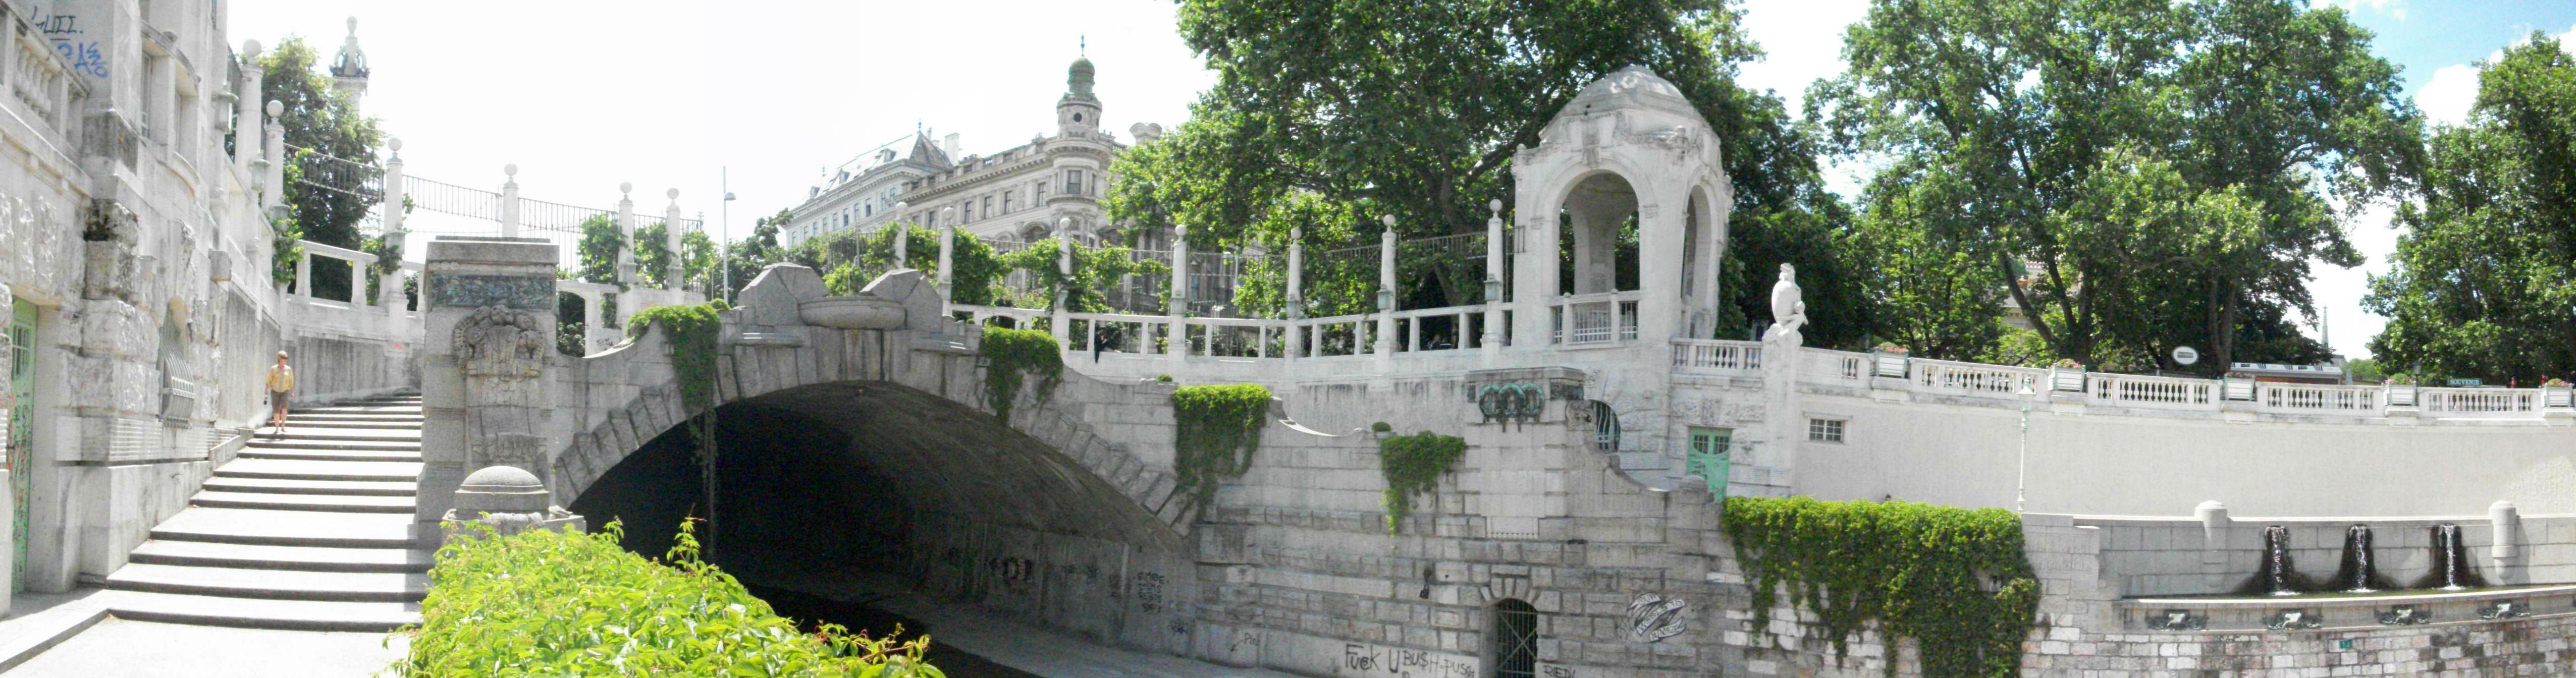 Puente en Stadtpark